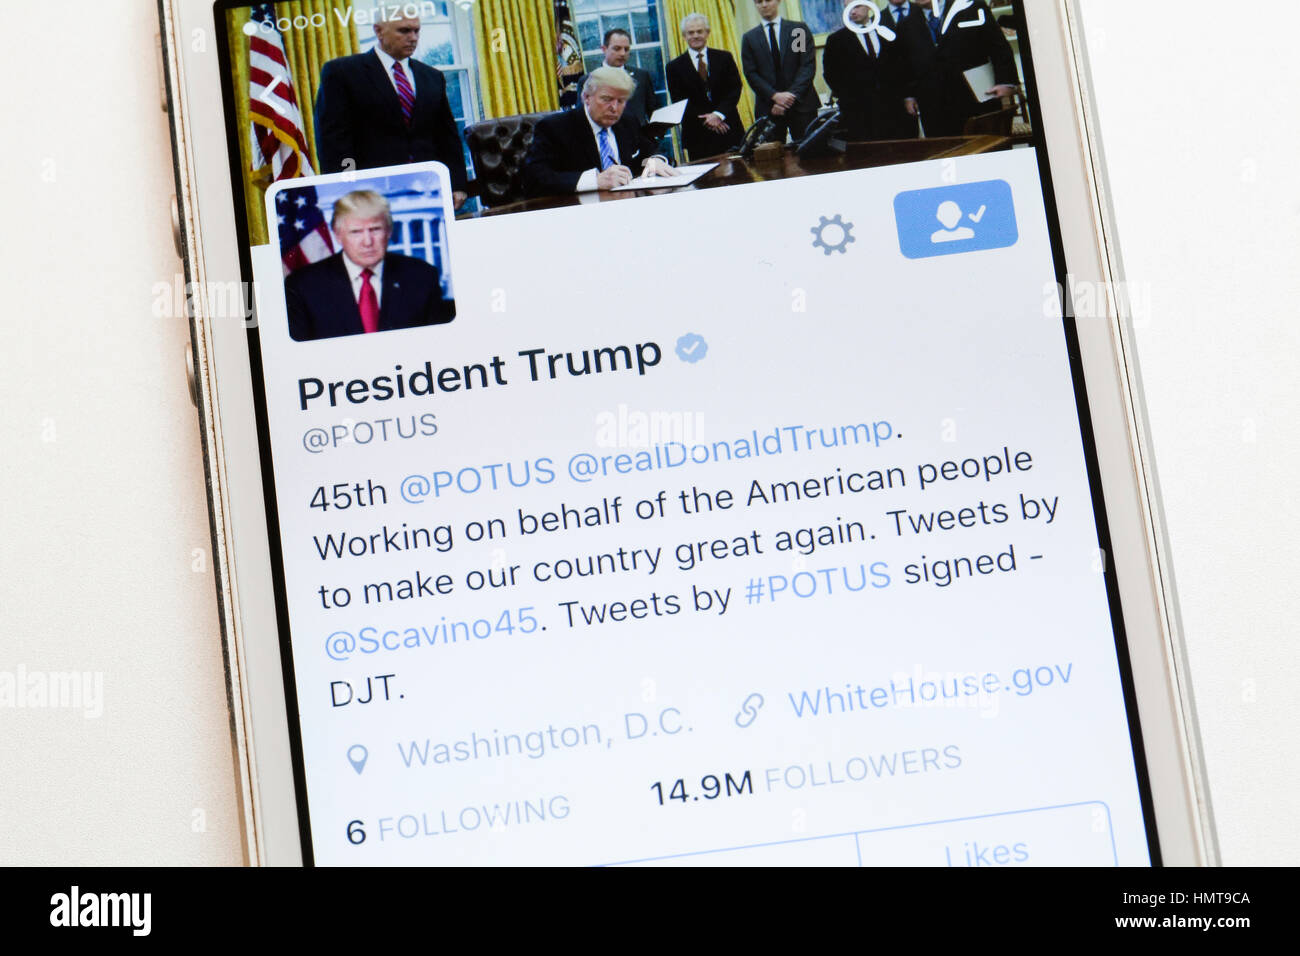 Donald Trump's POTUS twitter account on mobile phone screen - USA - Stock Image